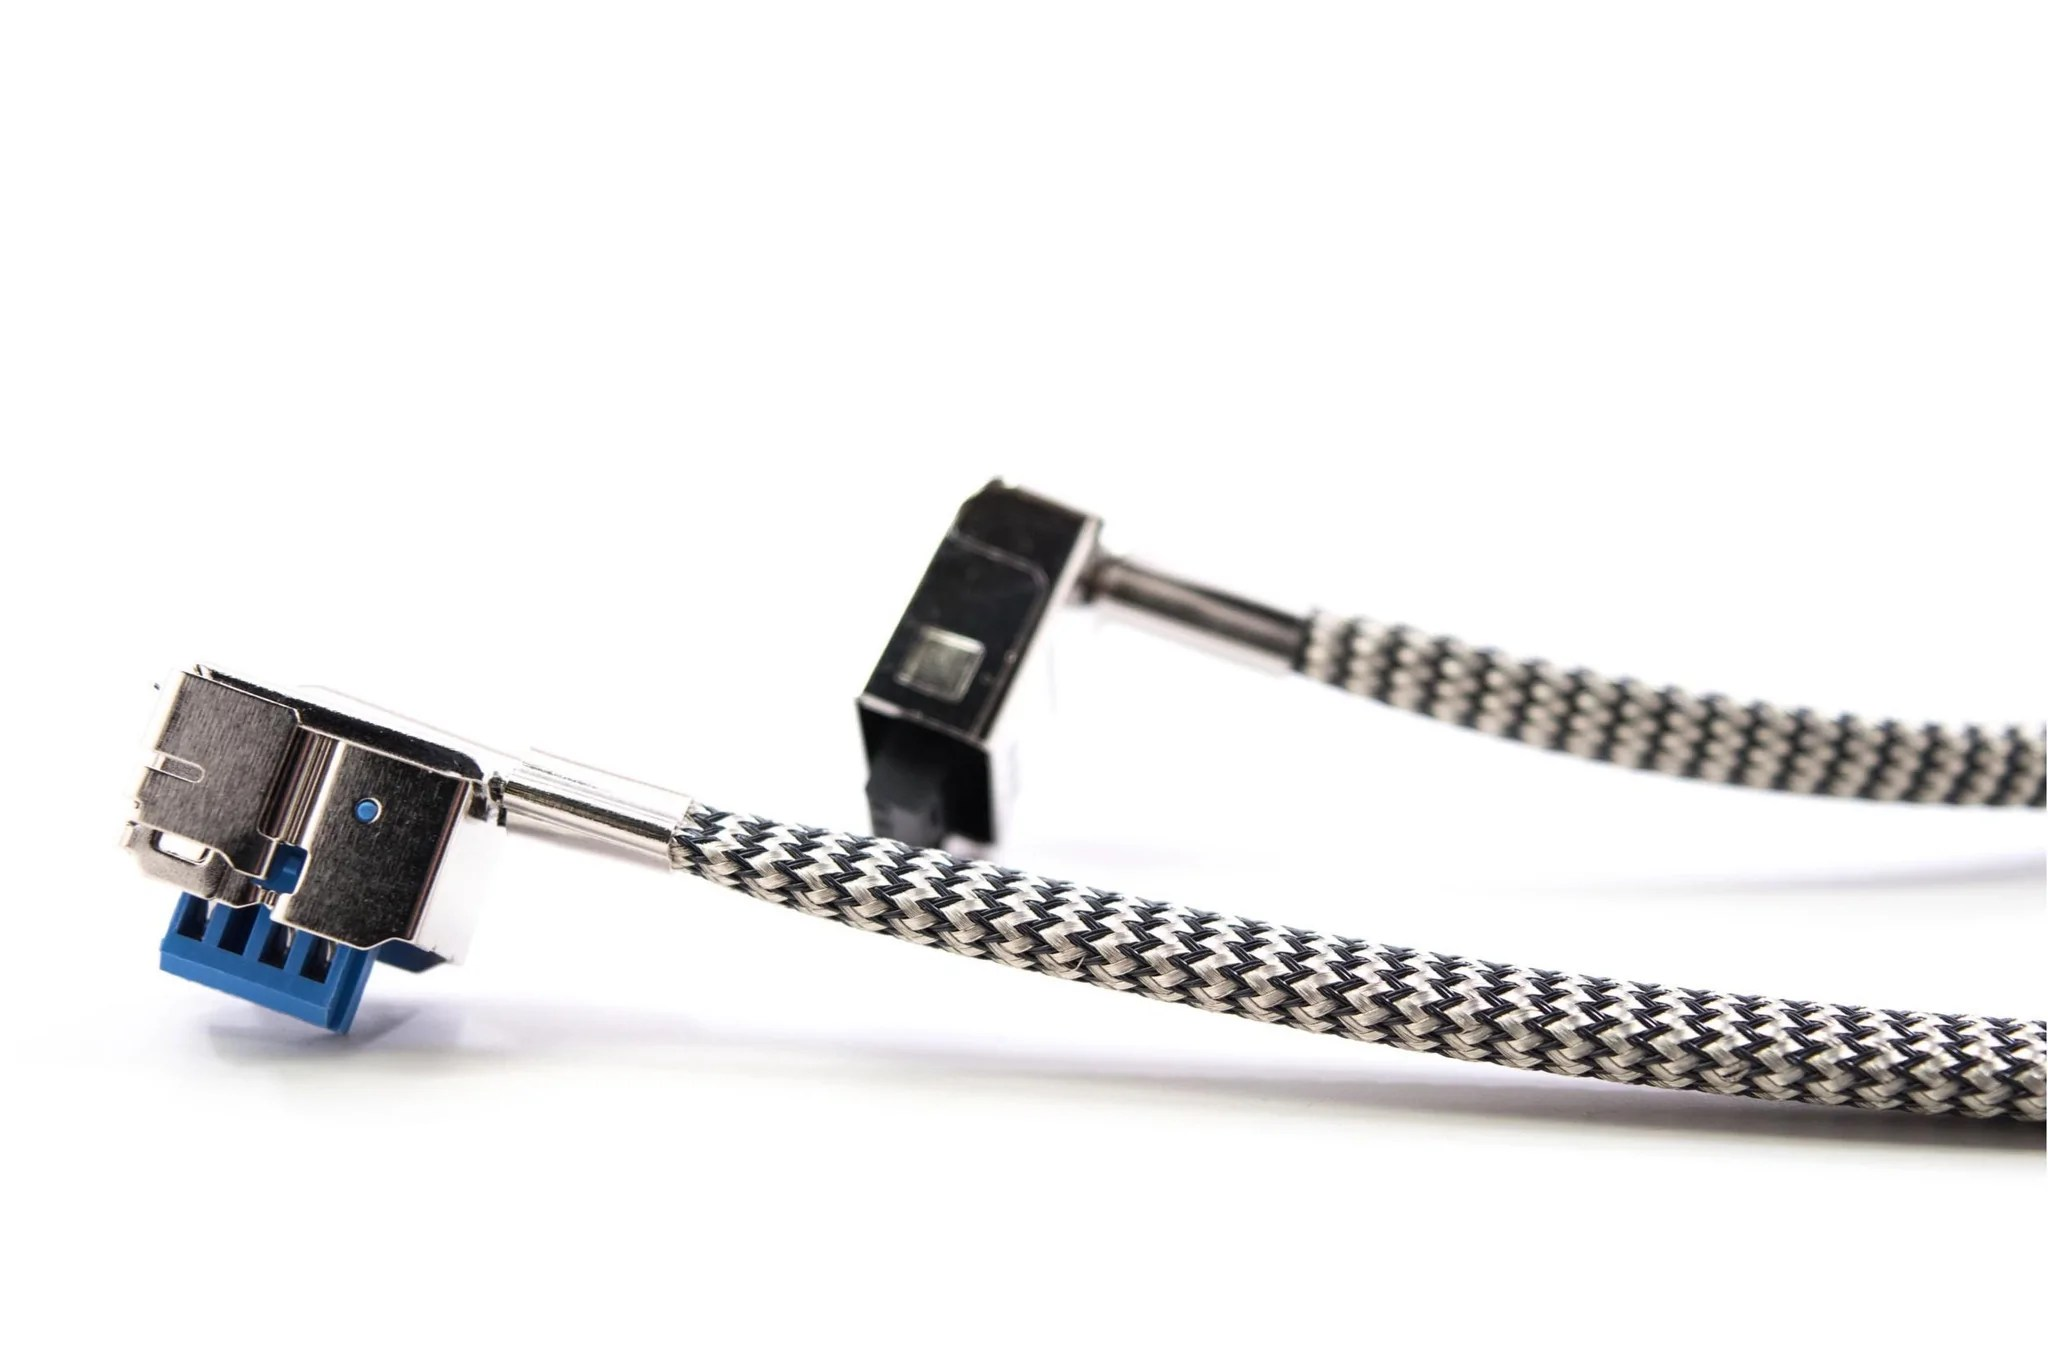 d1s d1r ballast to bulb cables [ 2048 x 1366 Pixel ]